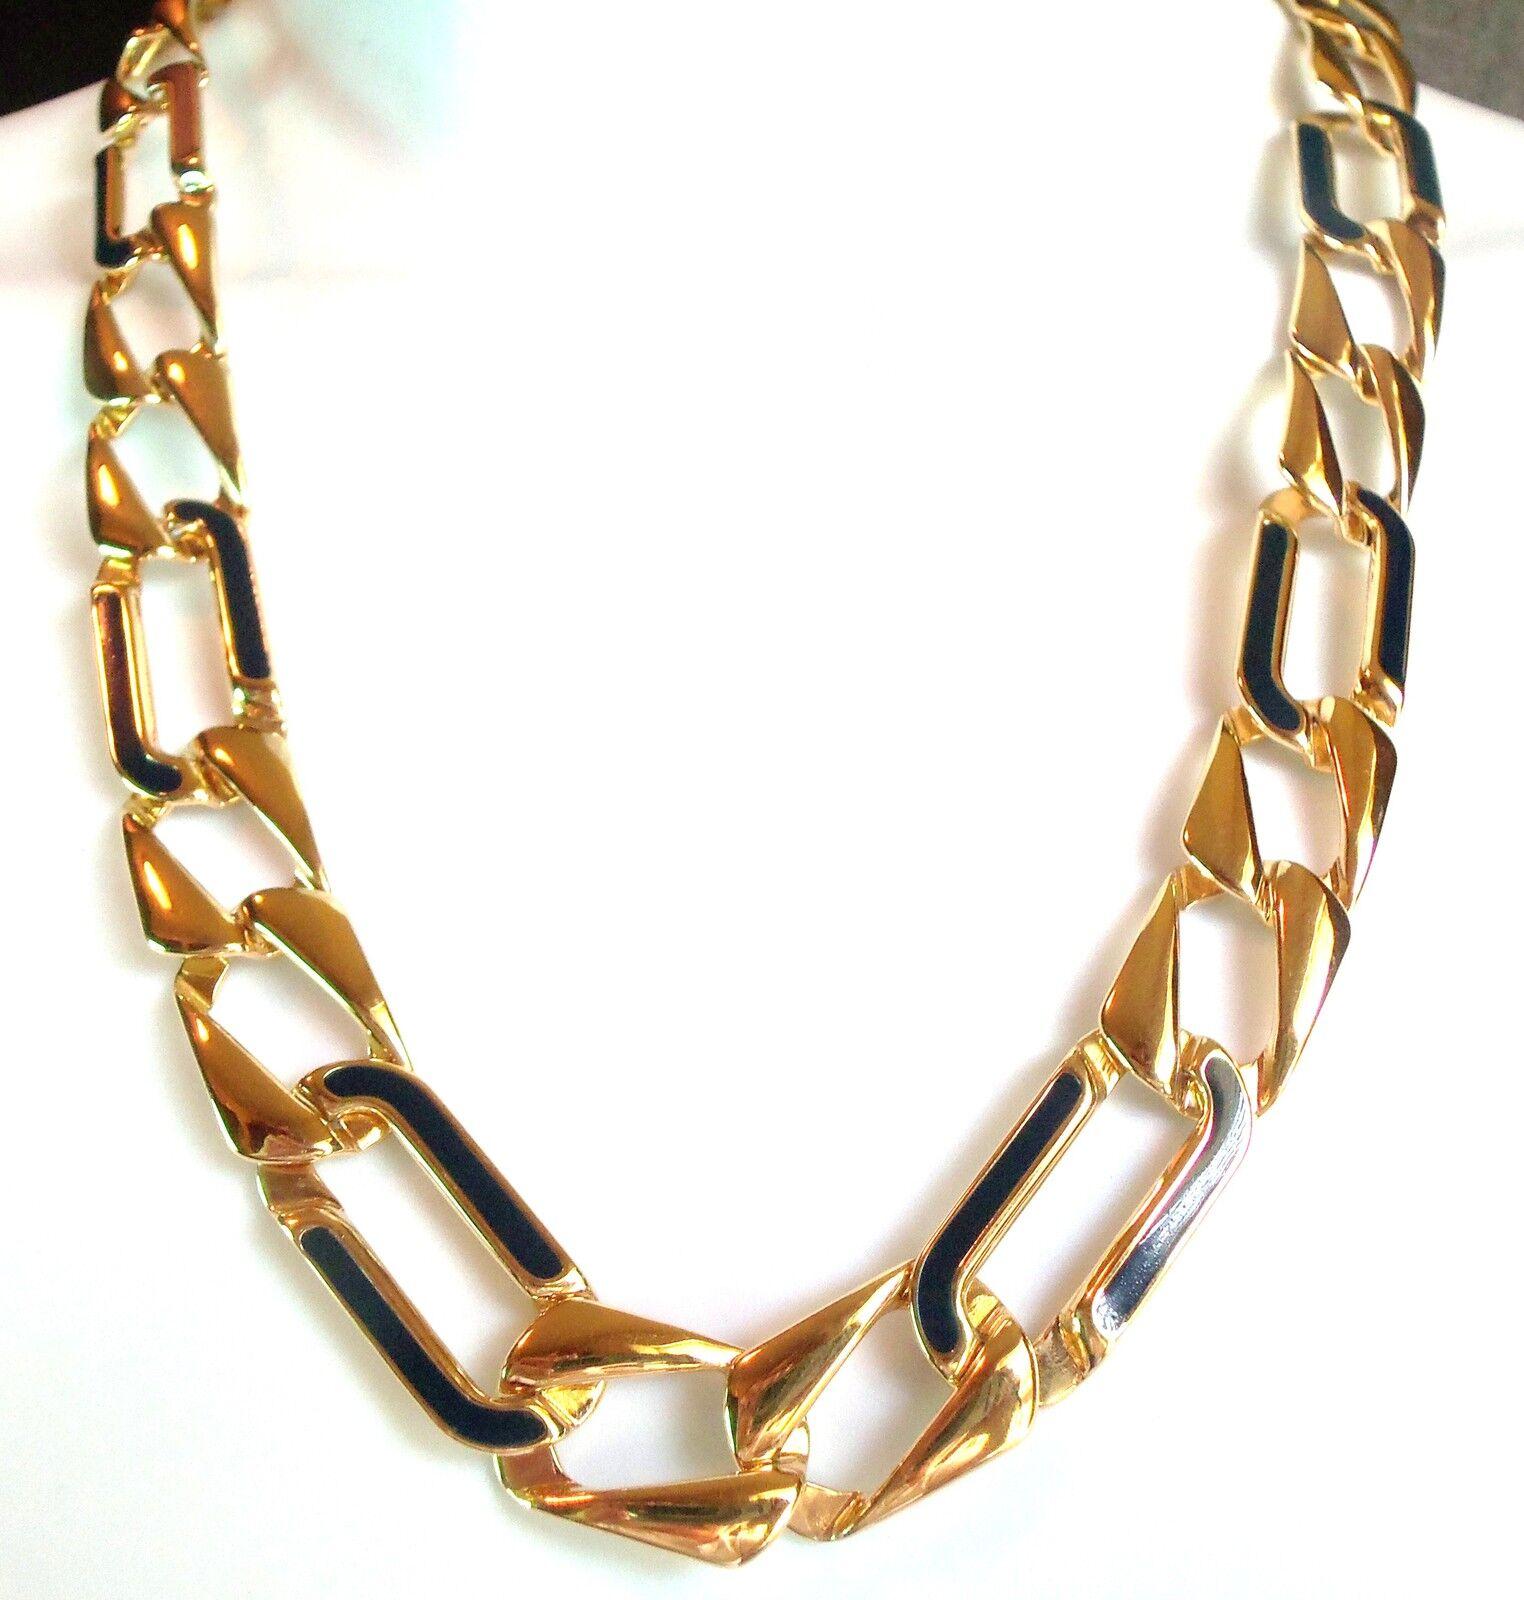 Elegant Vintage Monet Gold Plated Amp Black Chain Necklace